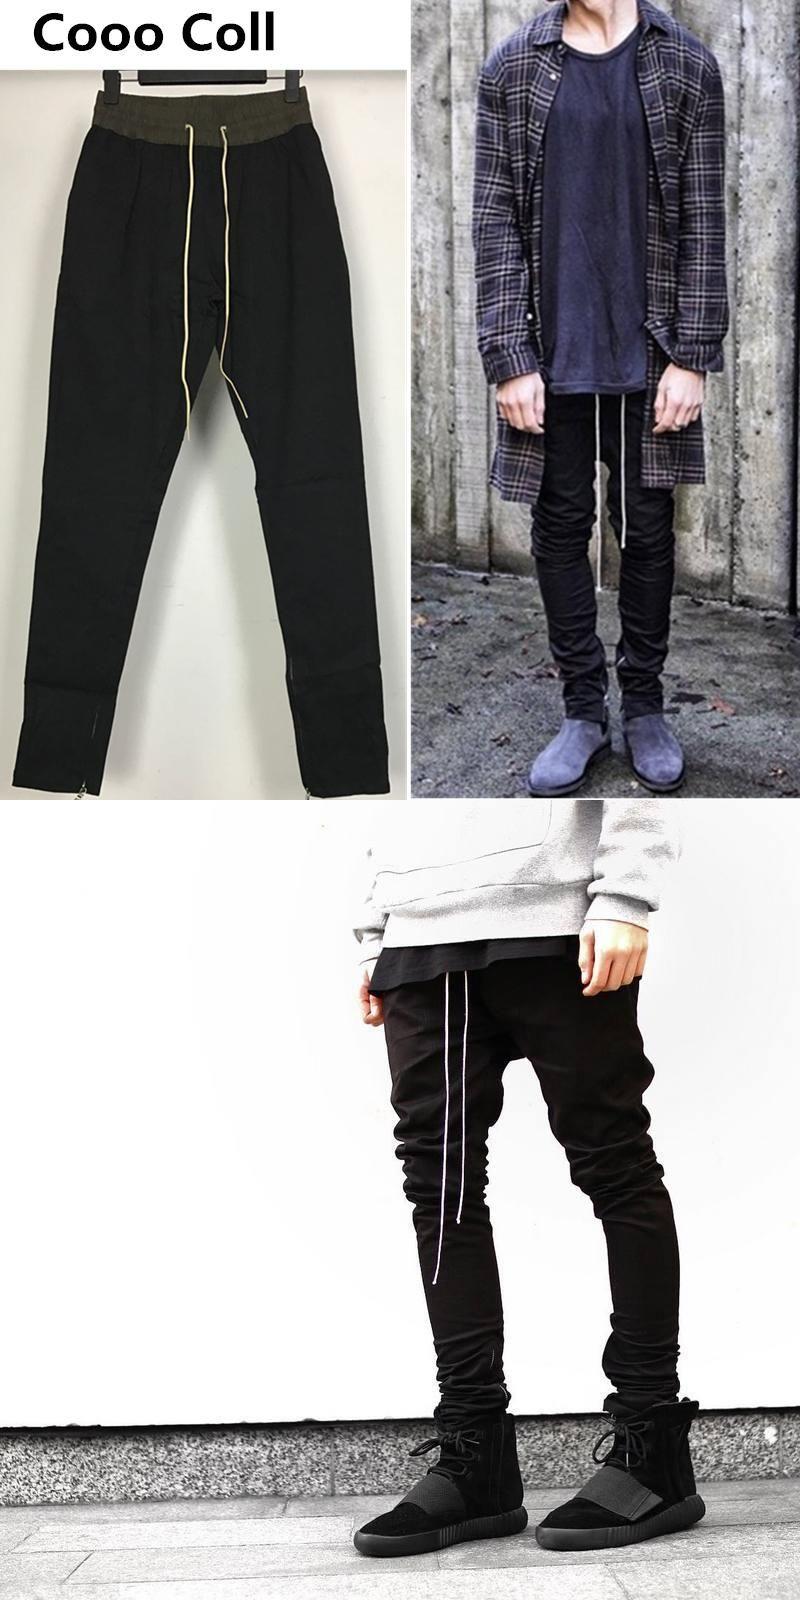 489514d9d06e 2017 New Men s pants Justin Bieber Slim Jogger Fear Of God trousers kanye  West Sweatpants Long pants Black Grey IACB Store